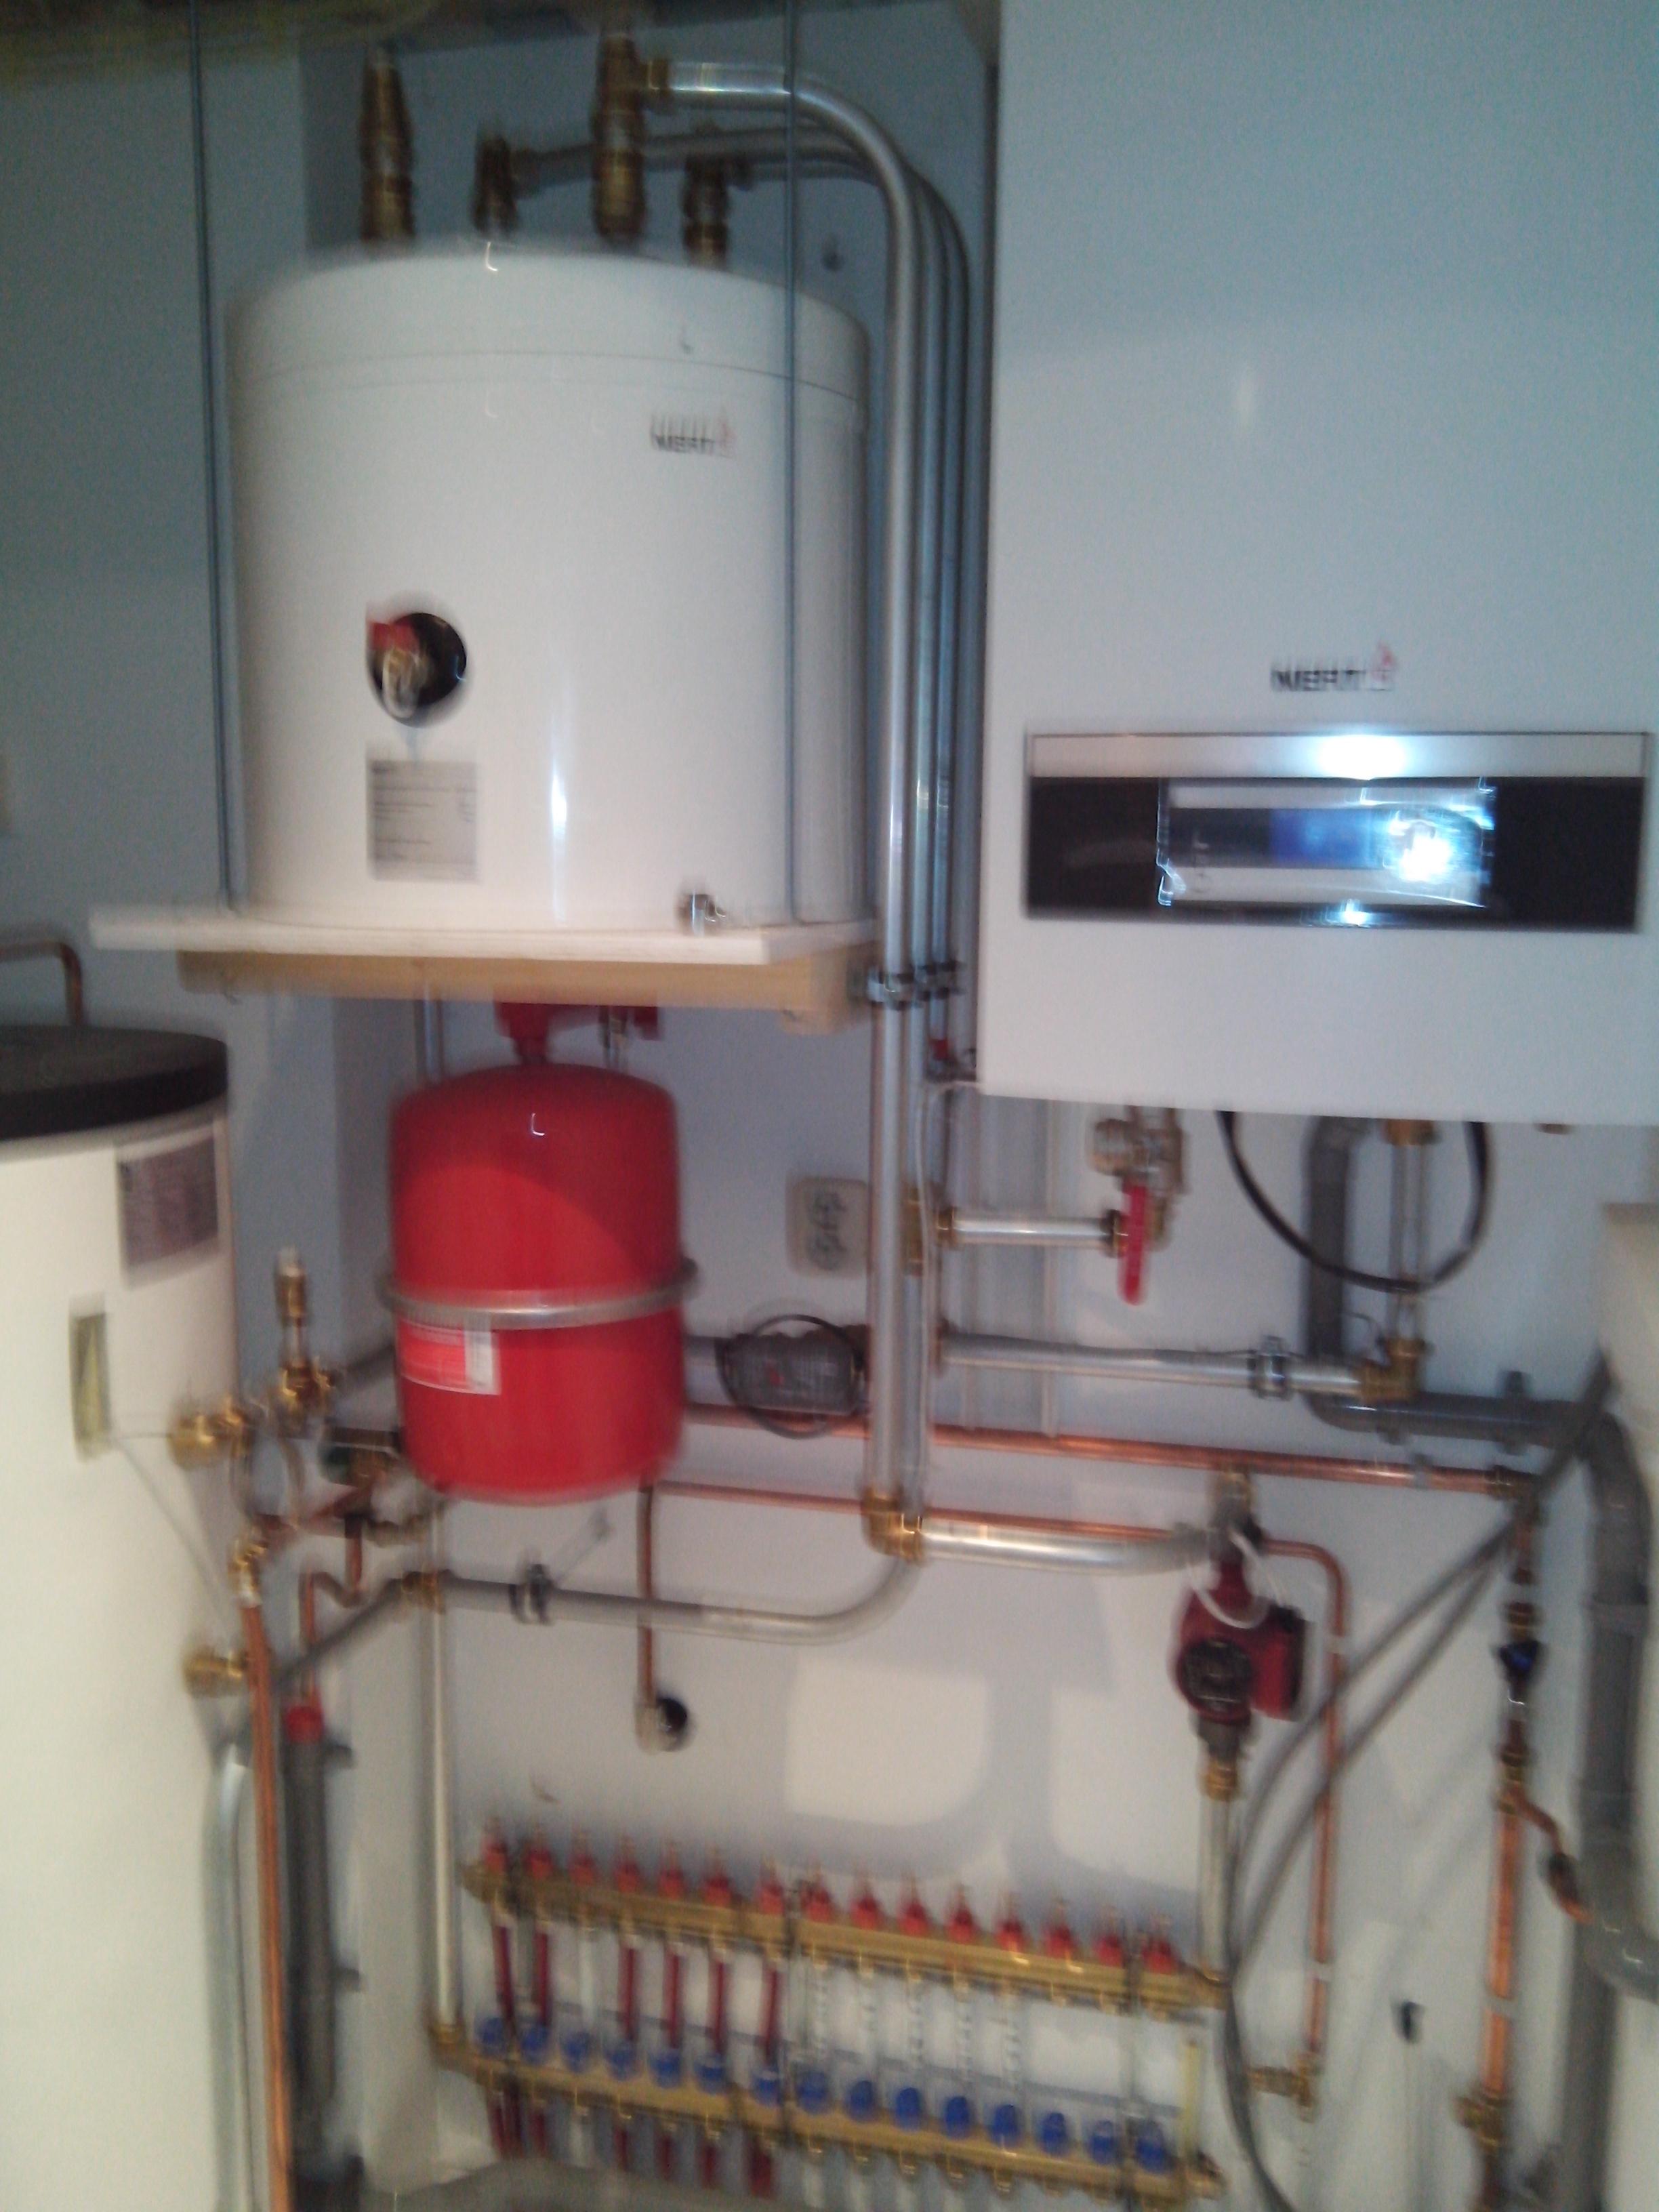 Warmtepompinstallatie